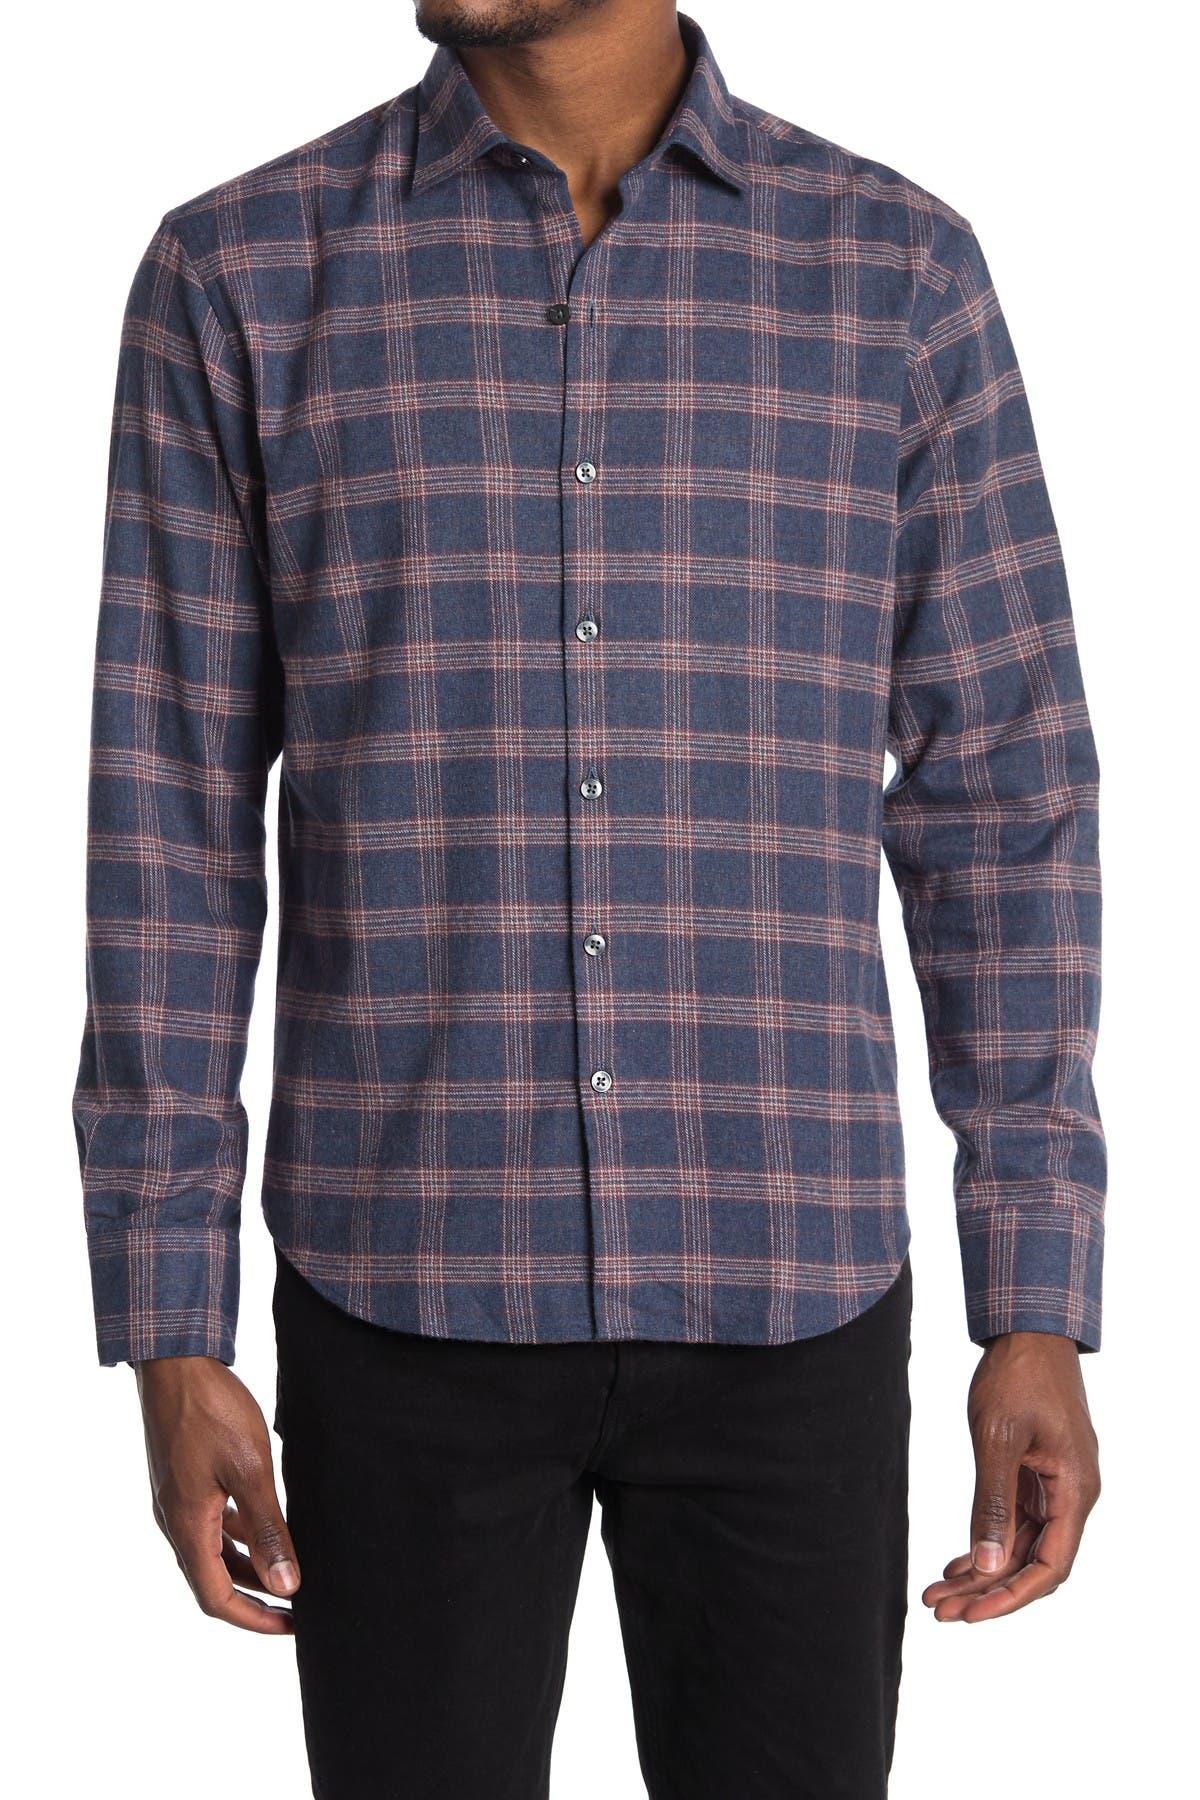 Image of ROBERT BARAKETT Rivington Long Sleeve Woven Shirt